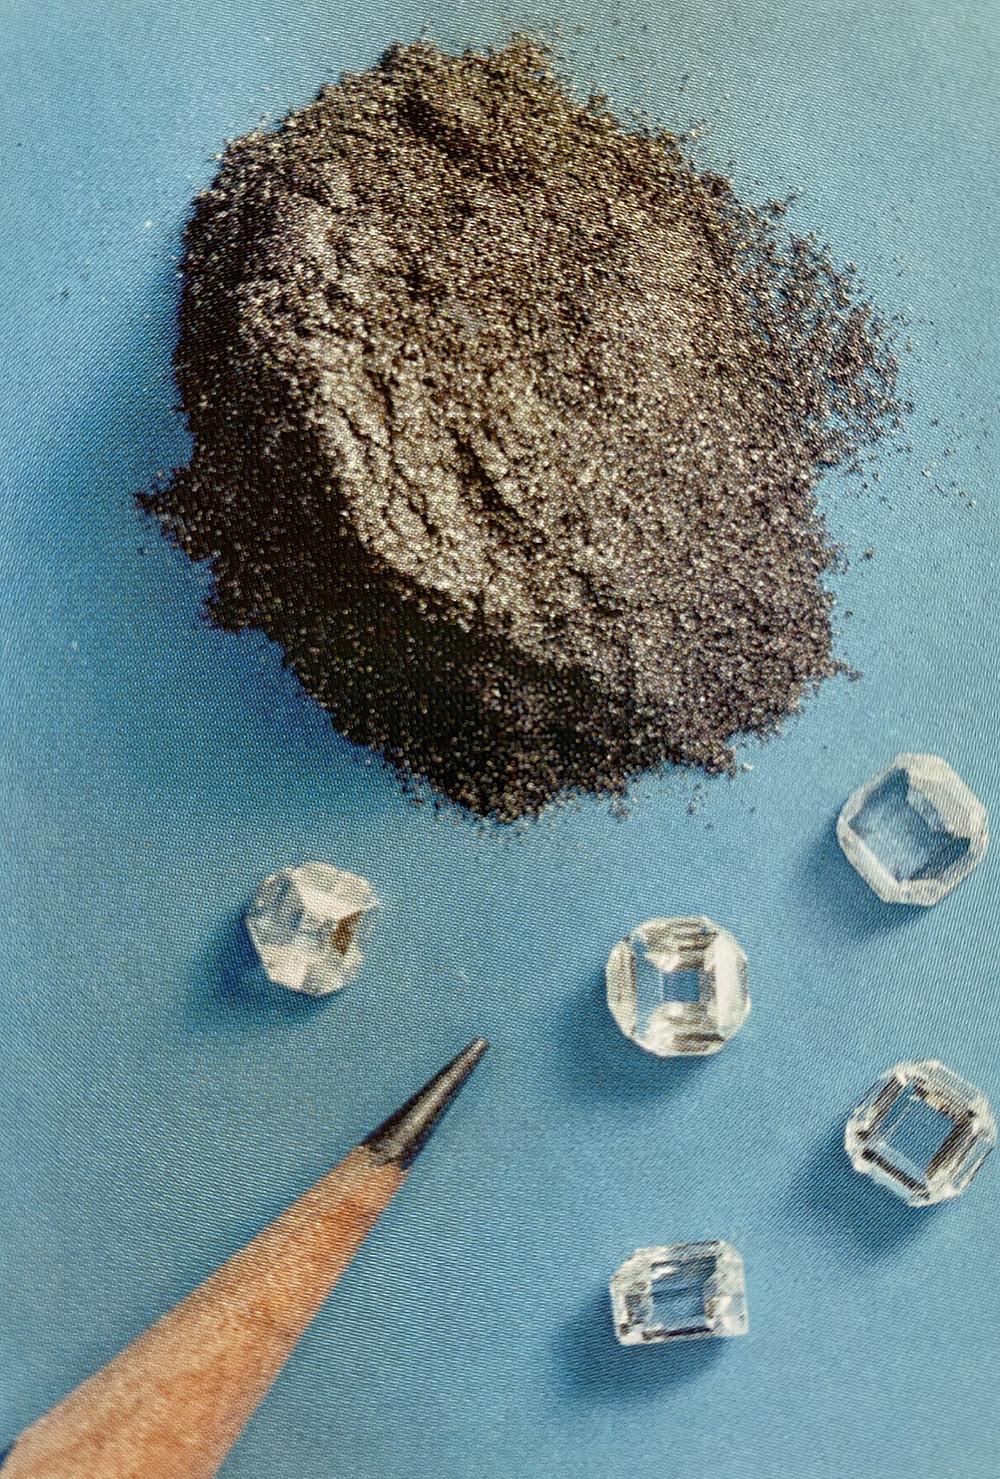 graphite pencil and loose diamond comparison on a blue background